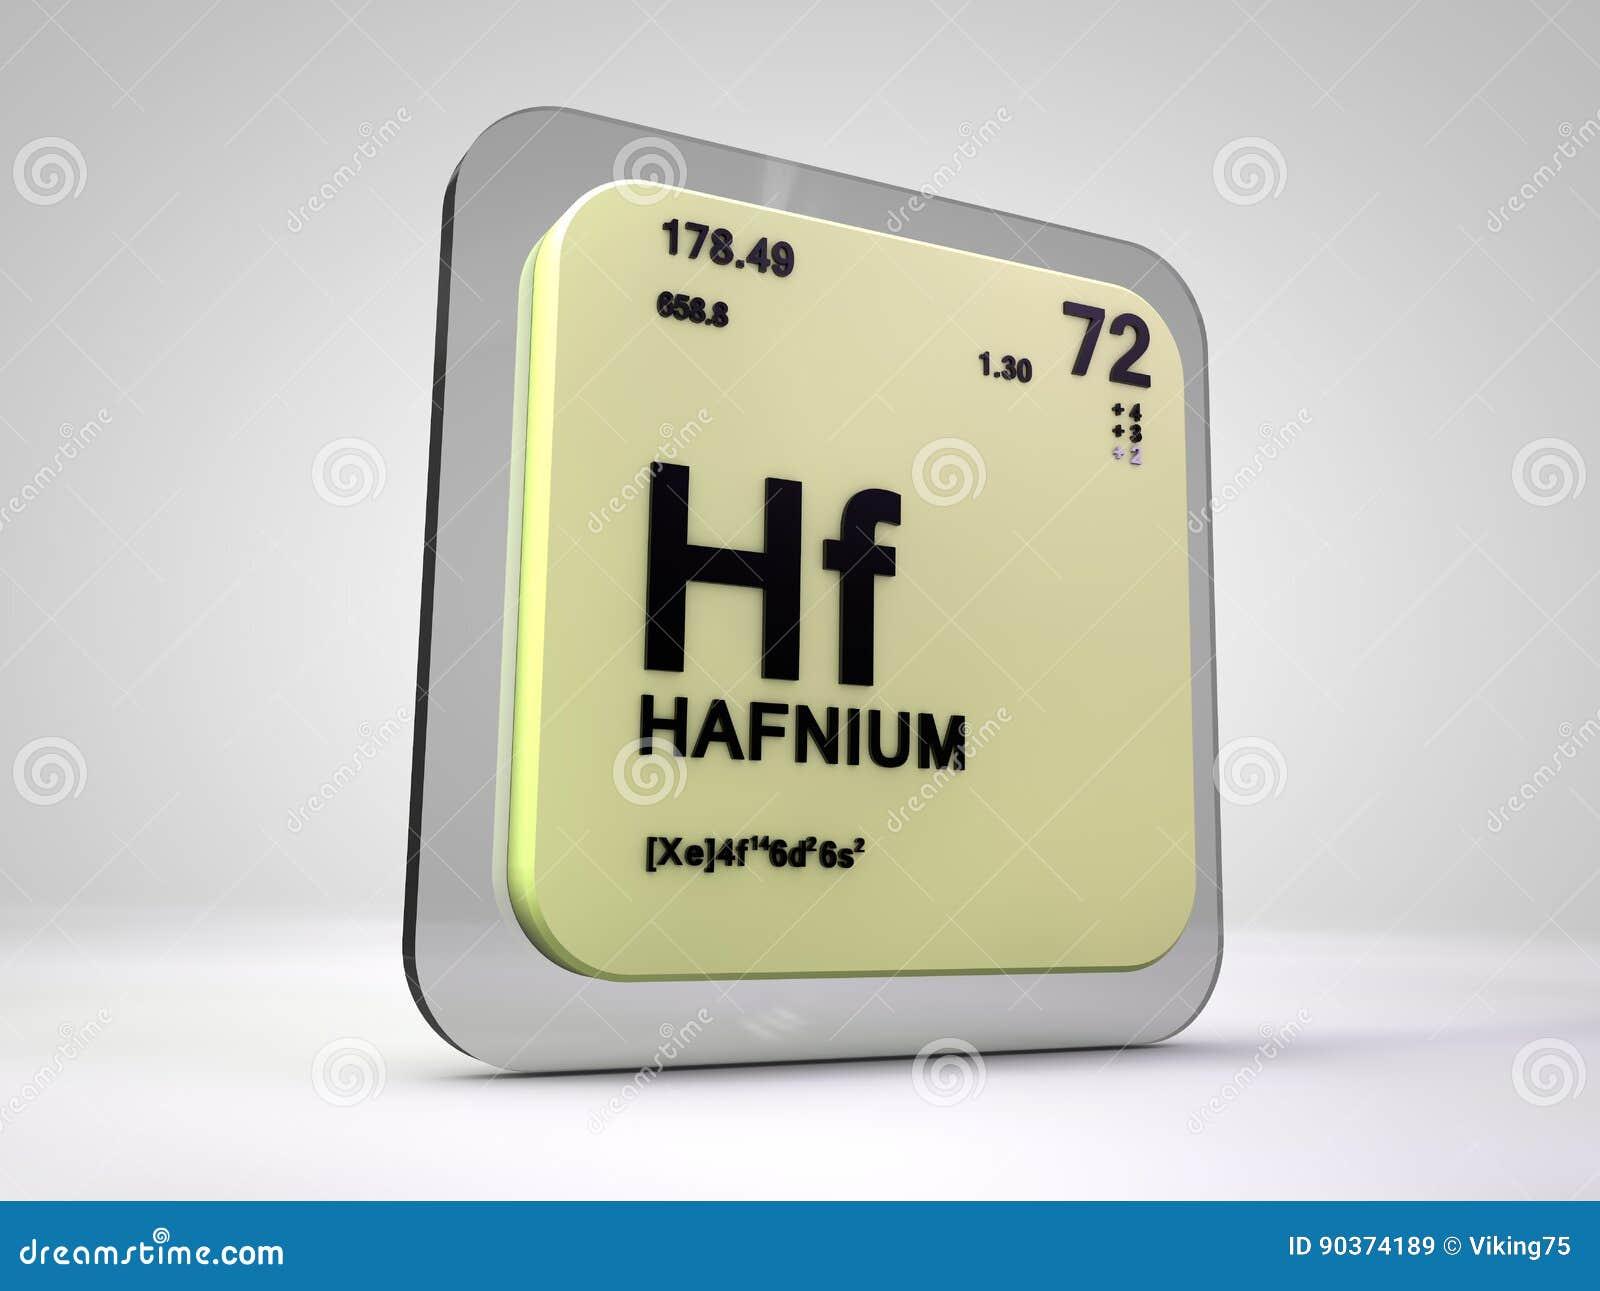 Hafnium hf chemical element periodic table stock illustration hafnium hf chemical element periodic table gamestrikefo Images